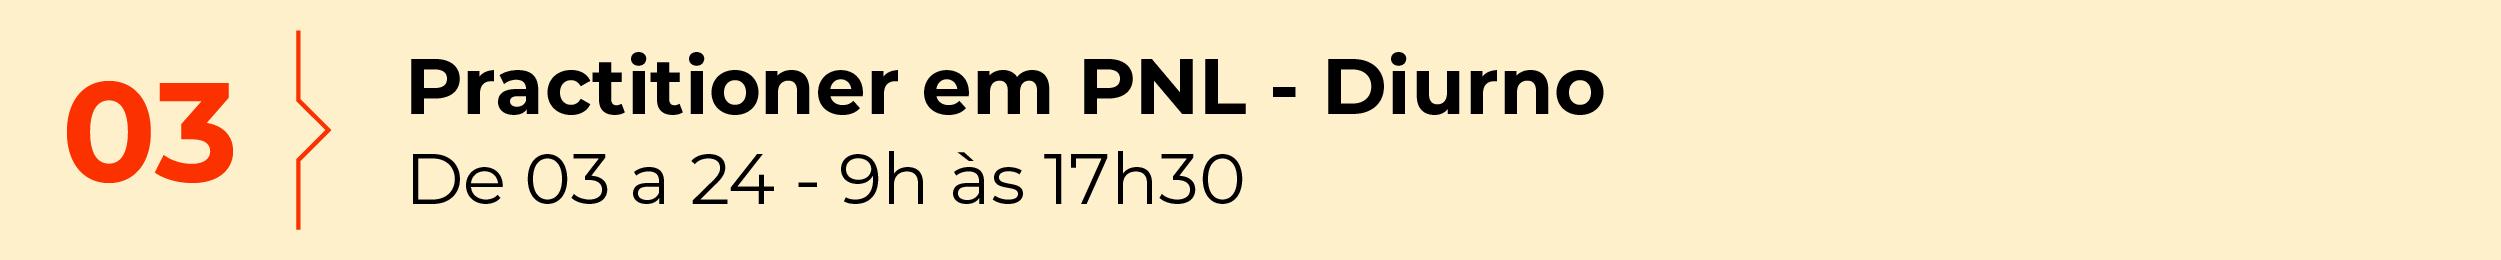 Practitioner em PNL - Diurno